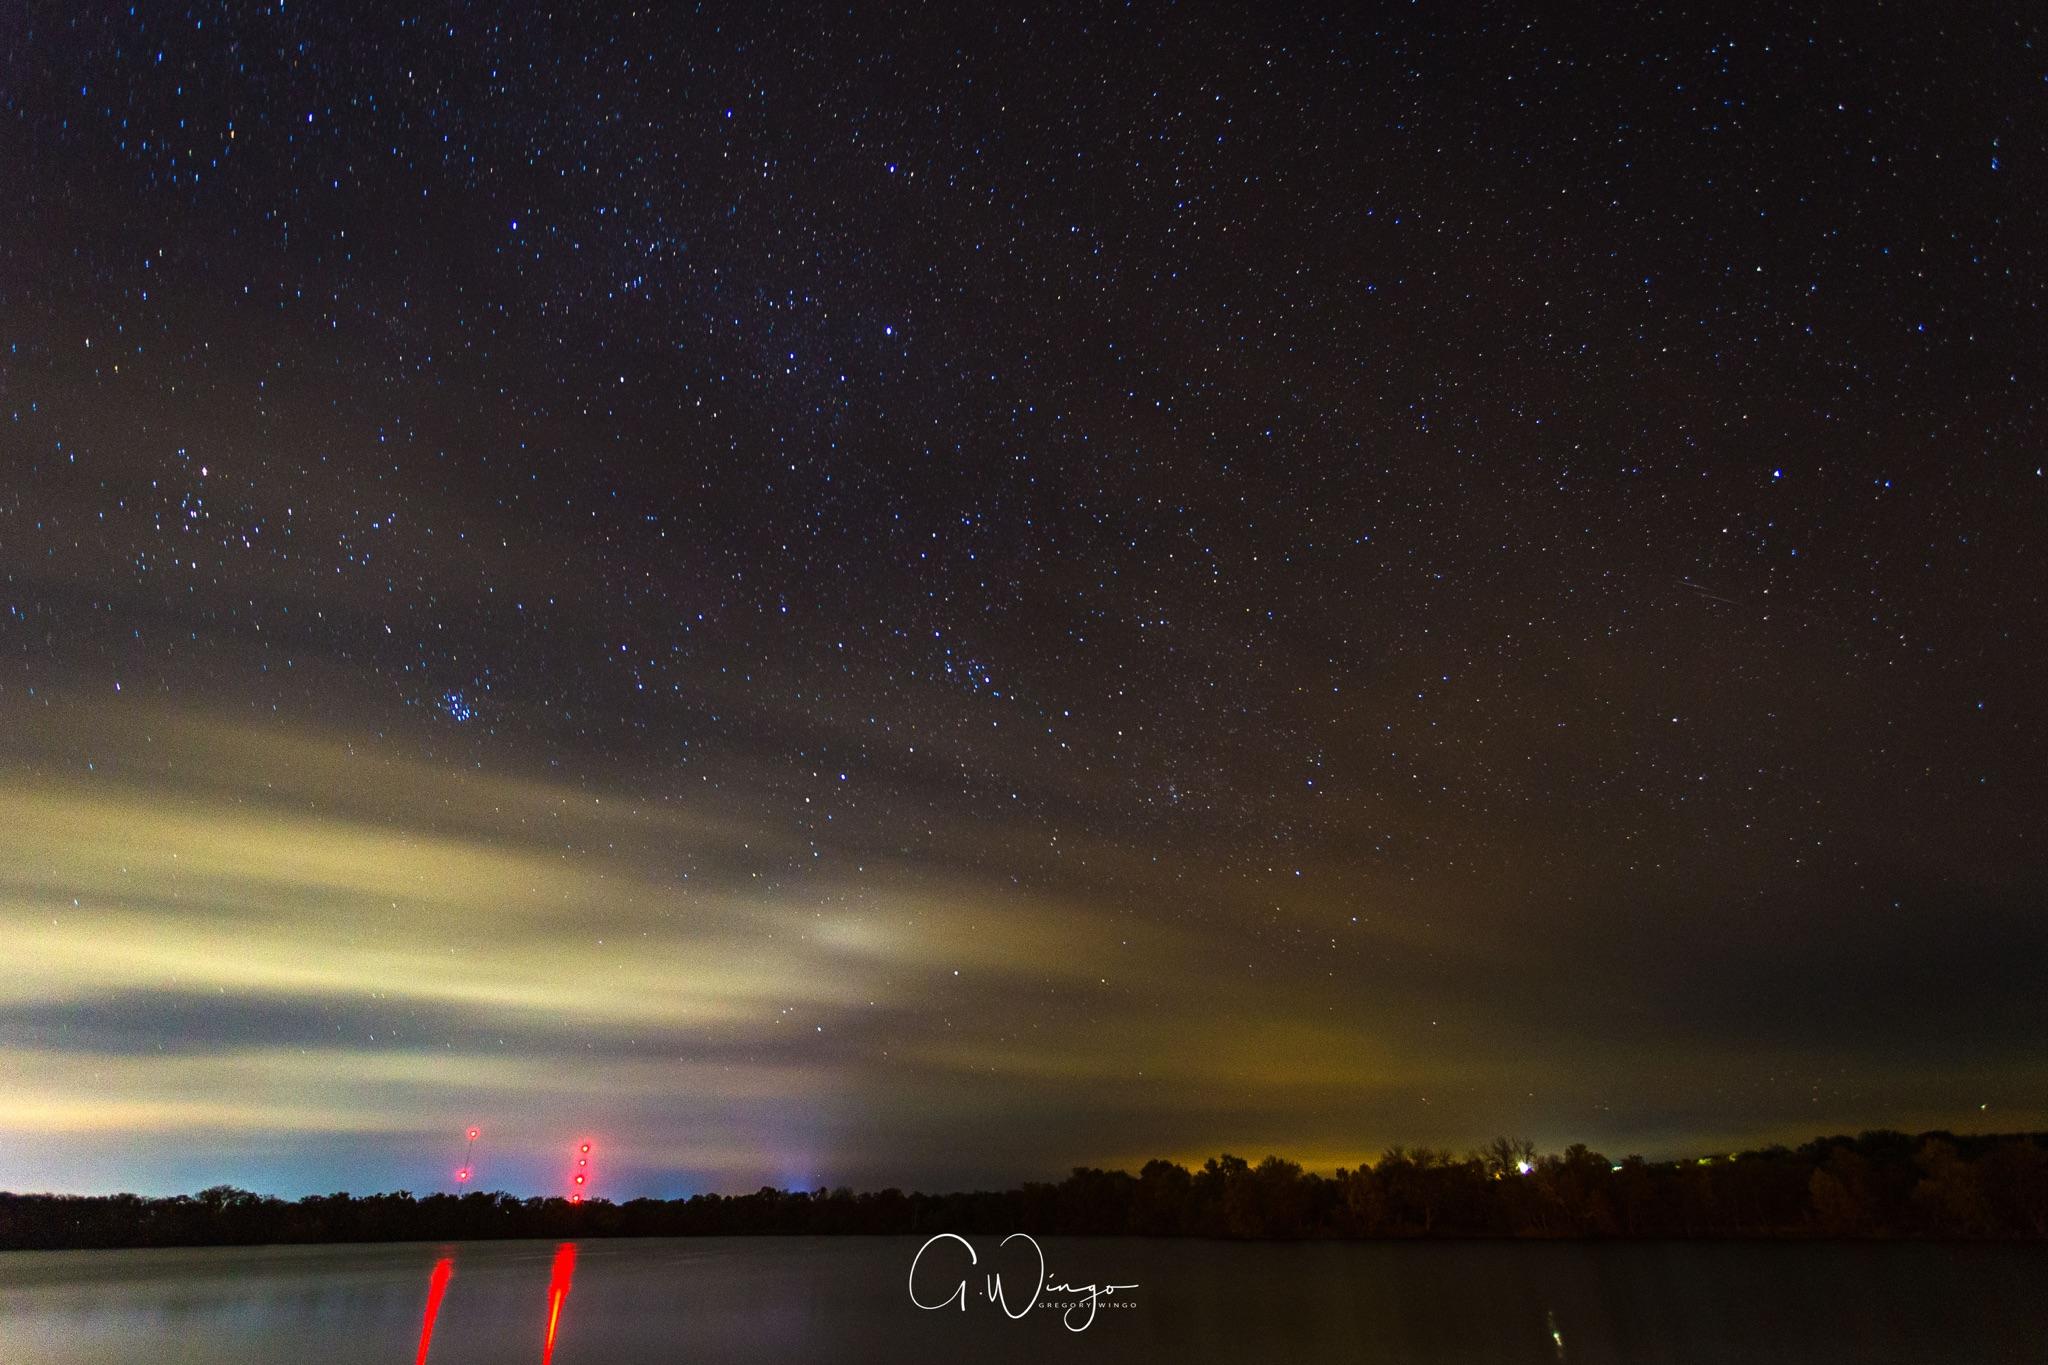 Fog rolling in at night over Inks Lake in Burnet, TX.  December 1, 2017.